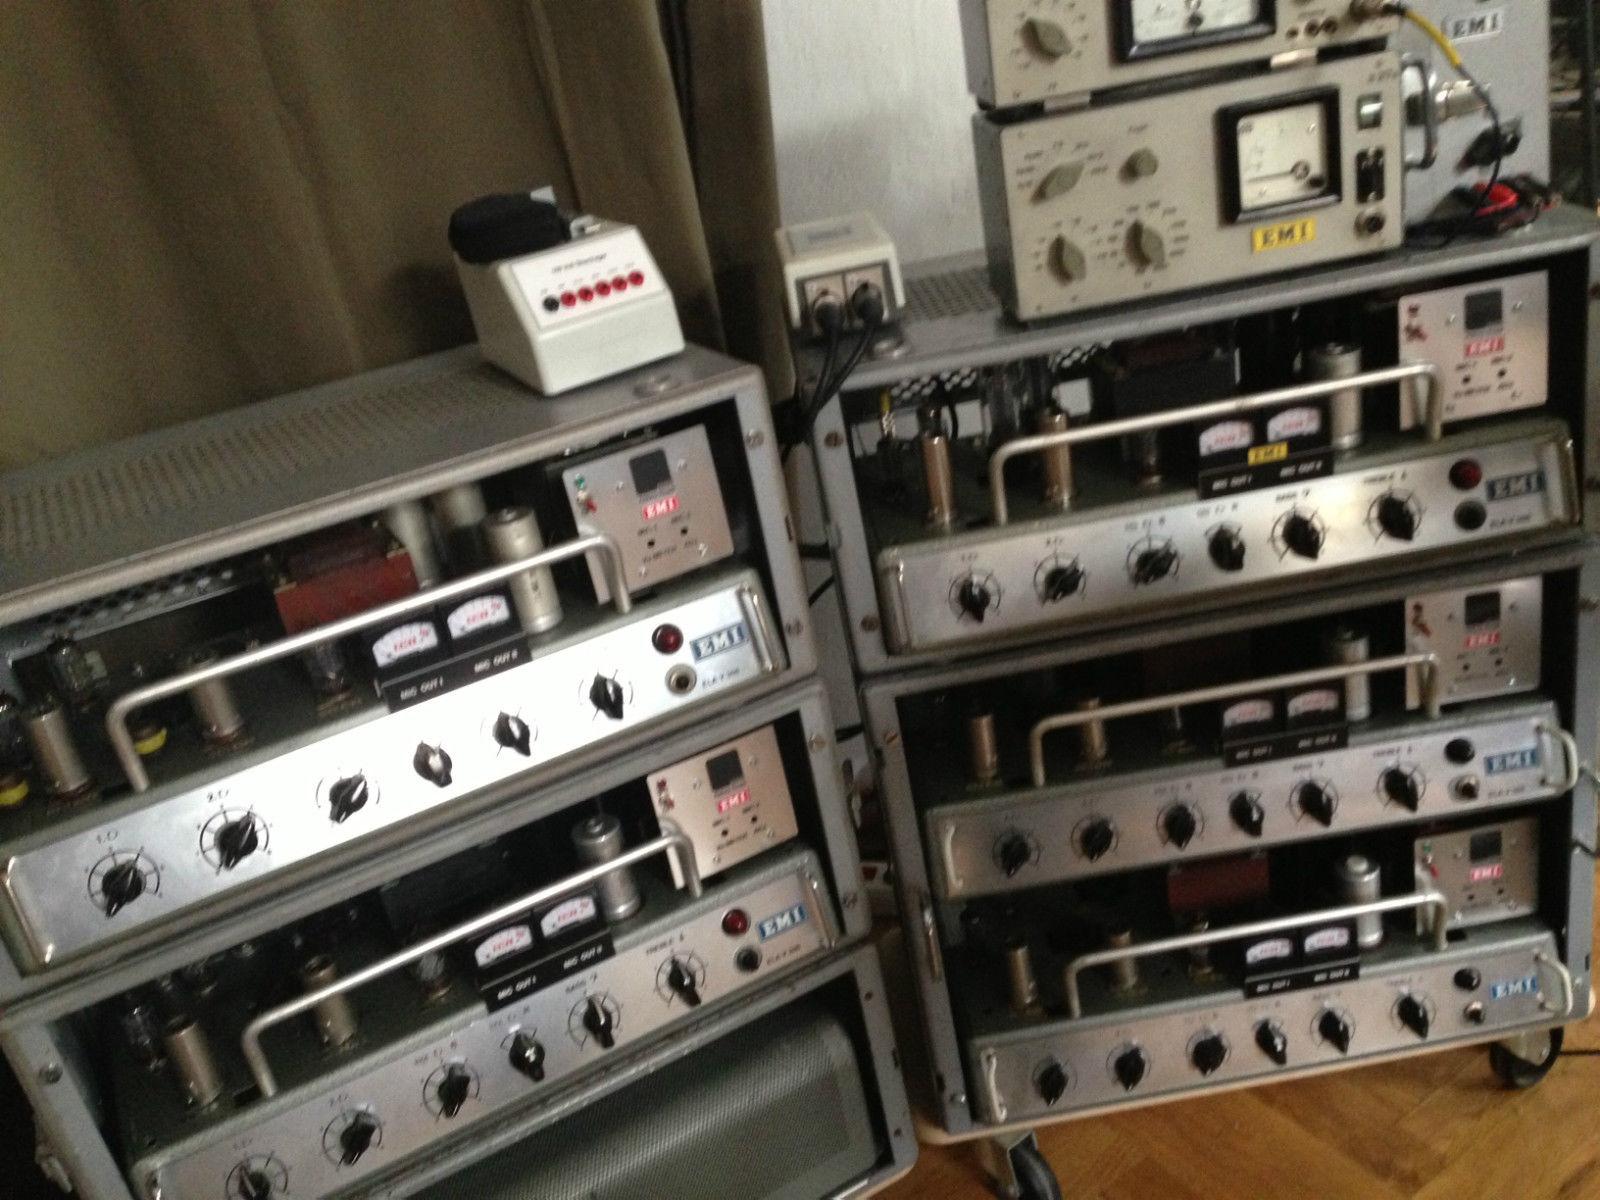 ã4 track tape recorder emiãã®ç»åæ¤ç´¢çµæ